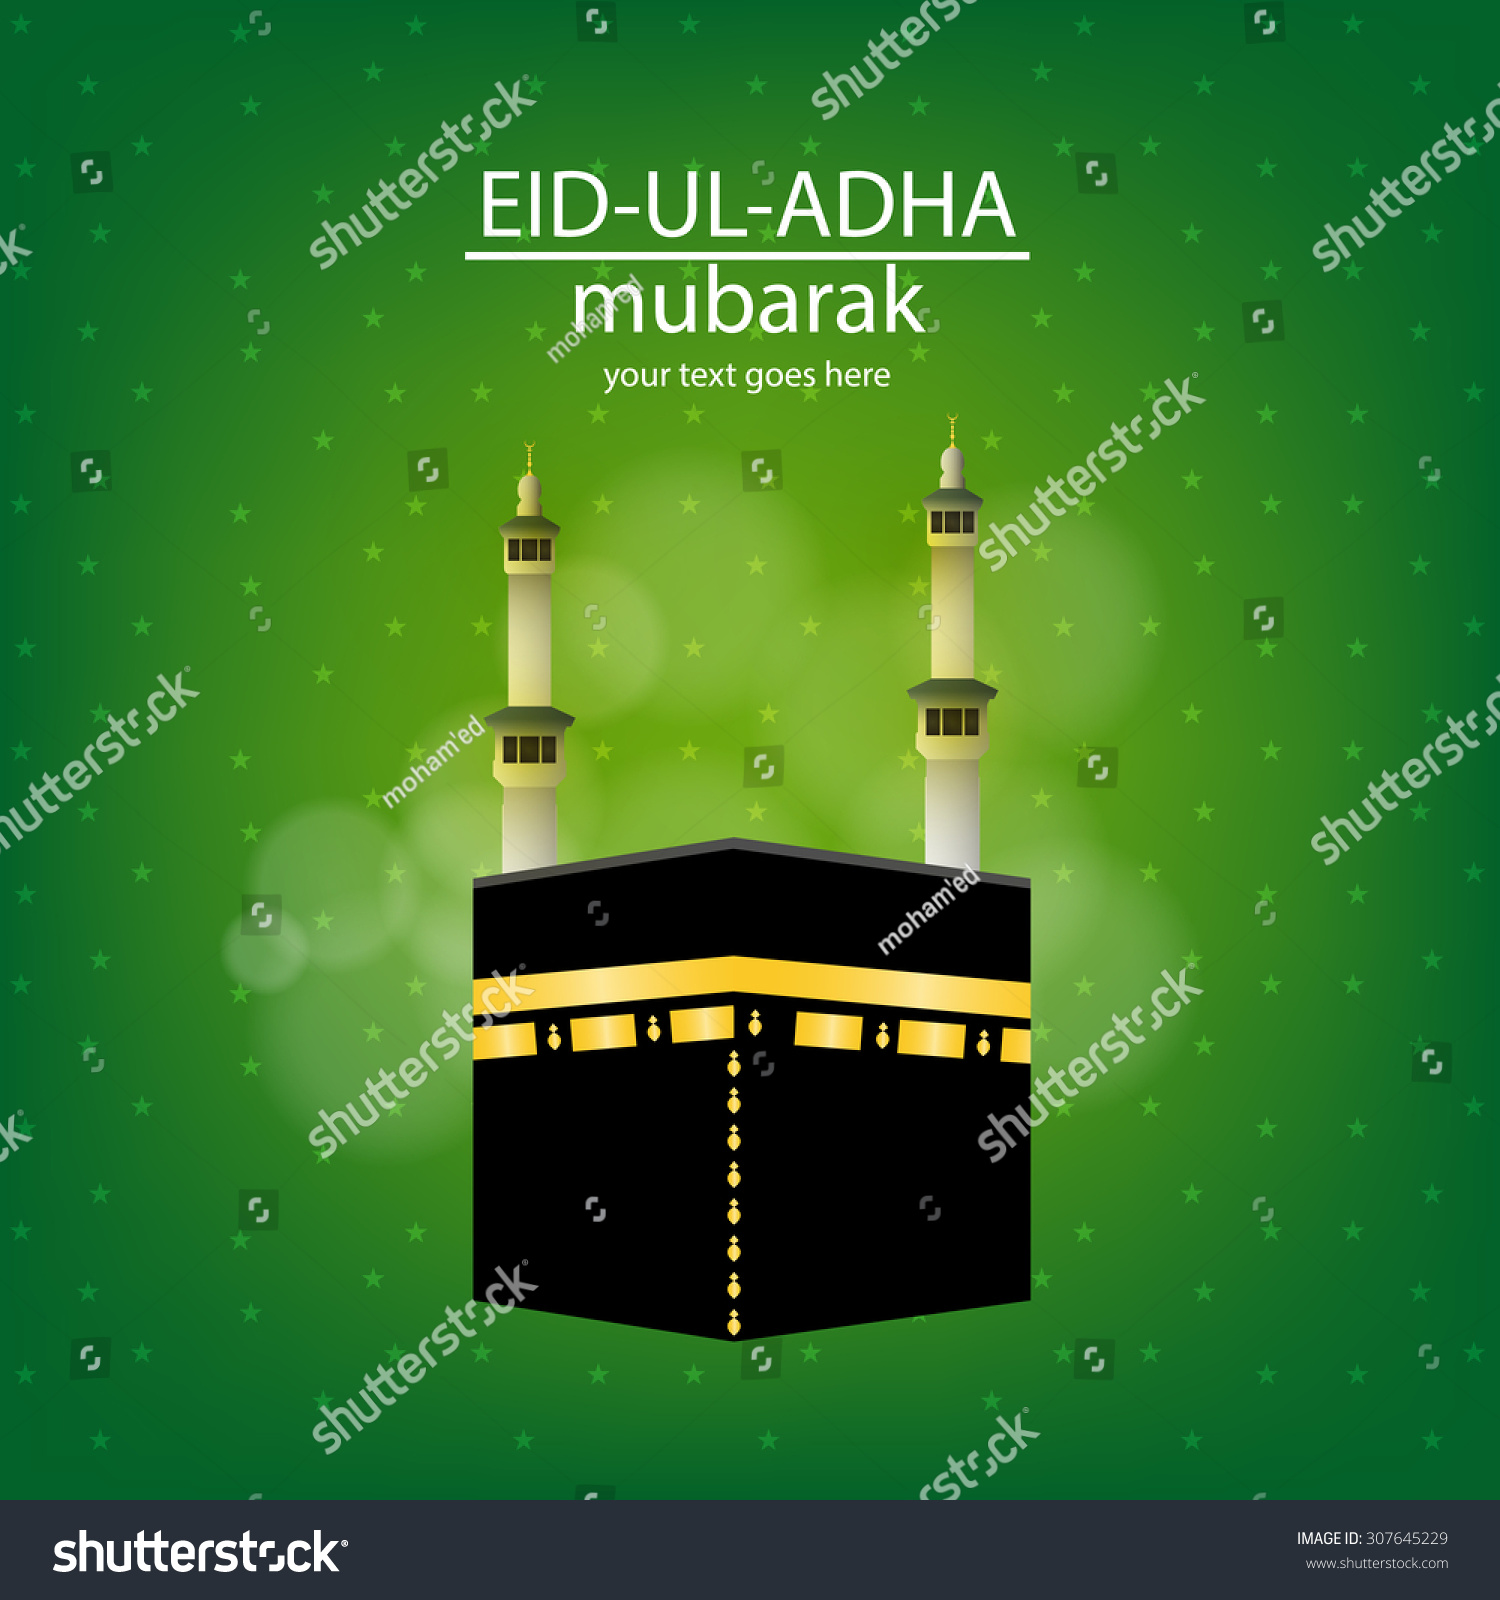 Eiduladha Mubarak On Vector Eid Greeting Stock Vector Royalty Free